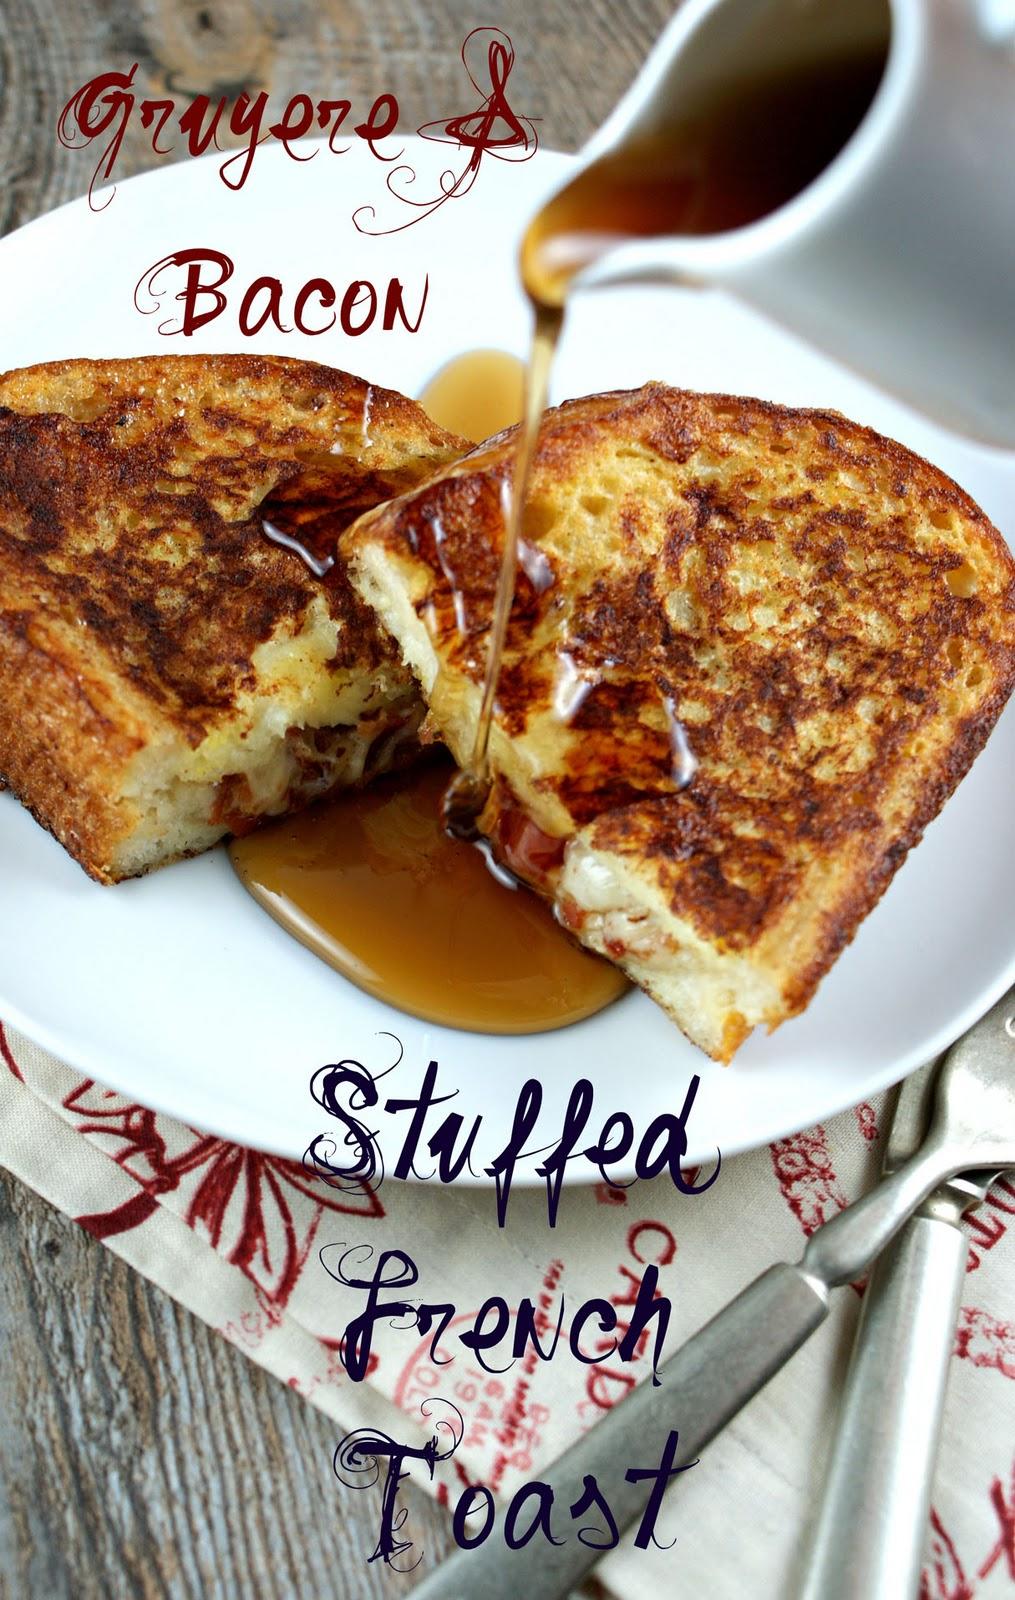 Authentic Suburban Gourmet: Gruyere & Bacon Stuffed French Toast